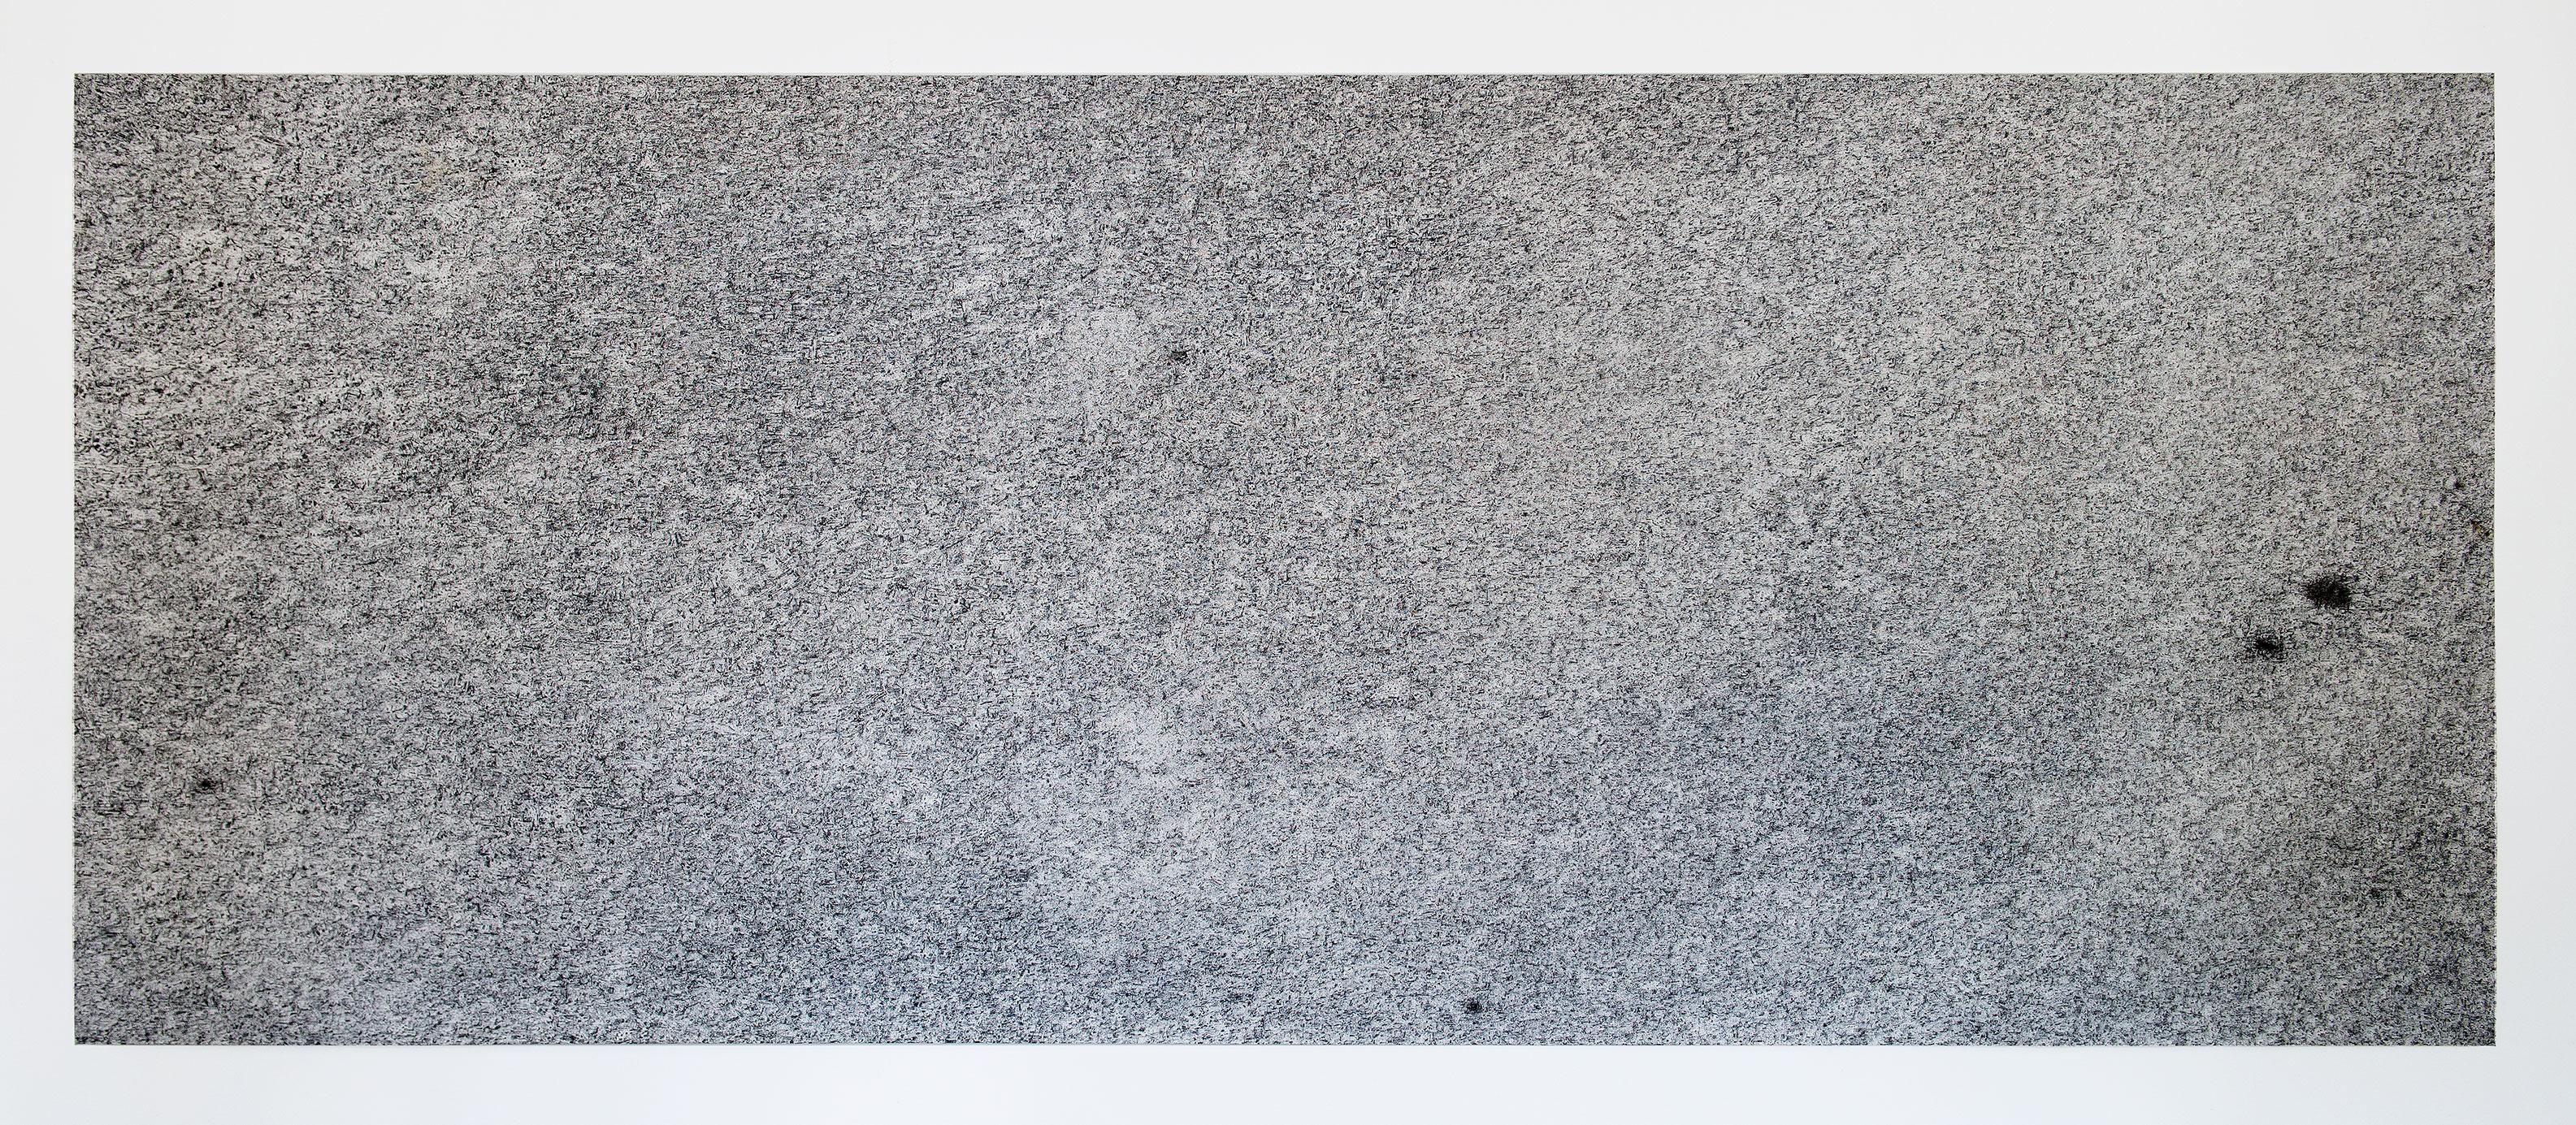 """DRUKI"" 2001, 212 x 525 cm"